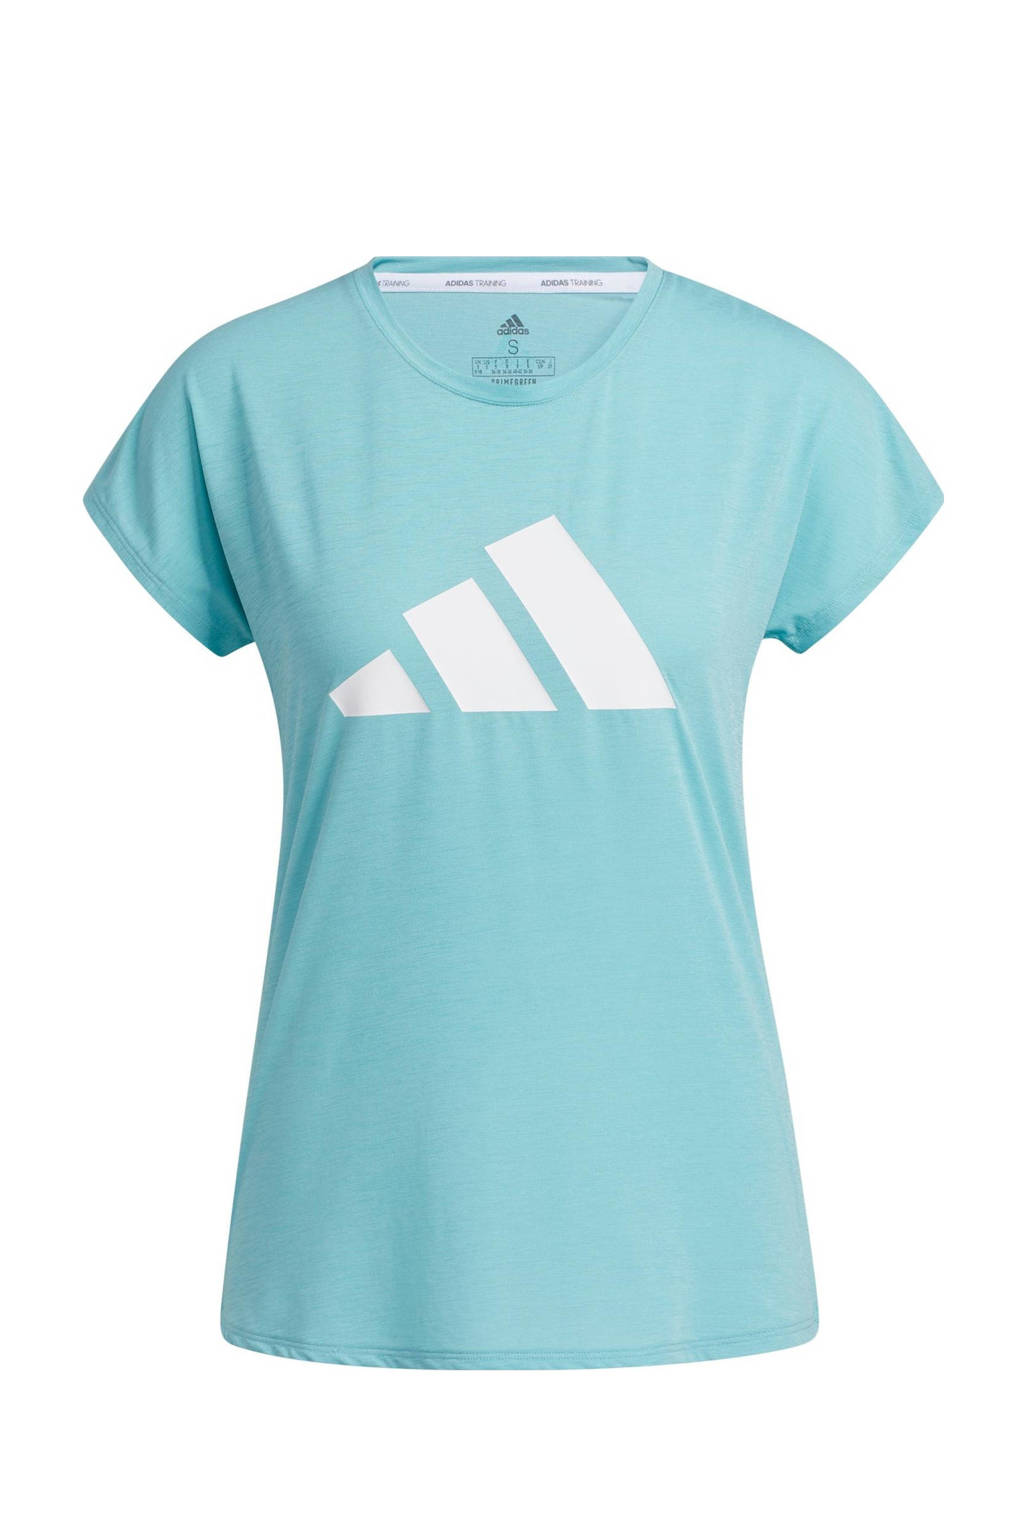 adidas Performance sport T-shirt mintgroen/wit, Mintgroen/wit